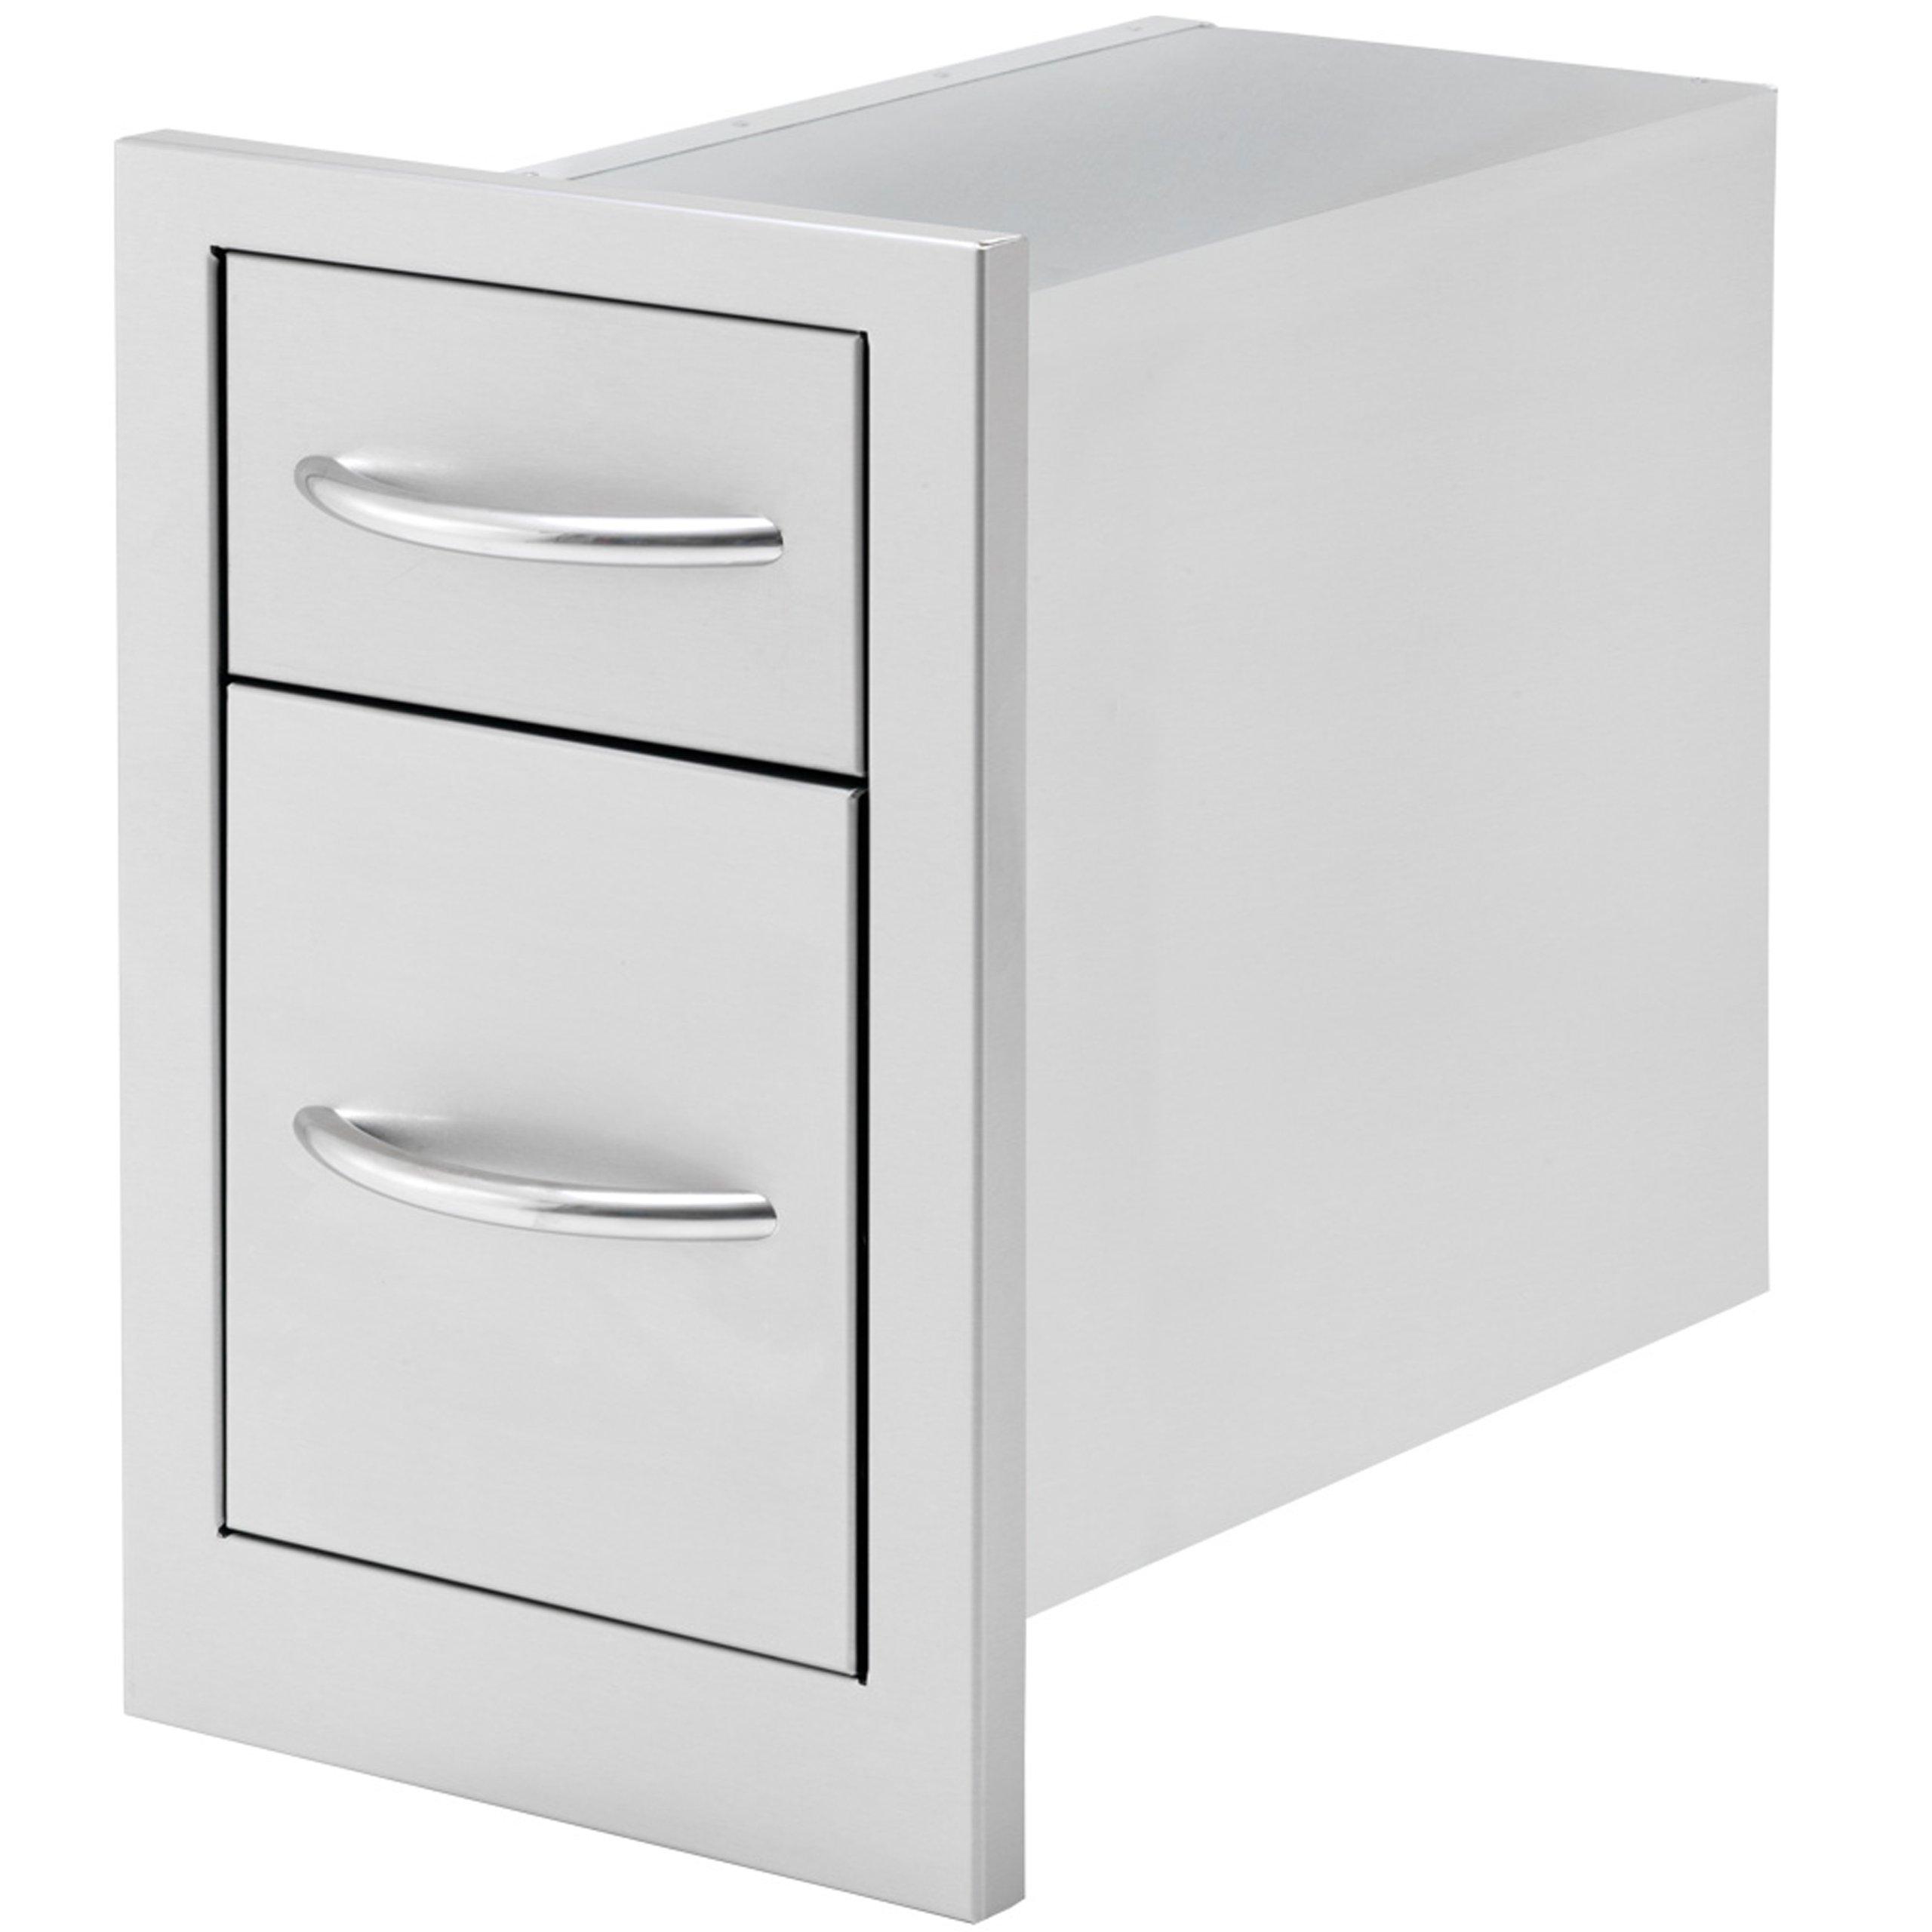 Cal Flame BBQ07868P 2 Drawer Storage Deep Drawer